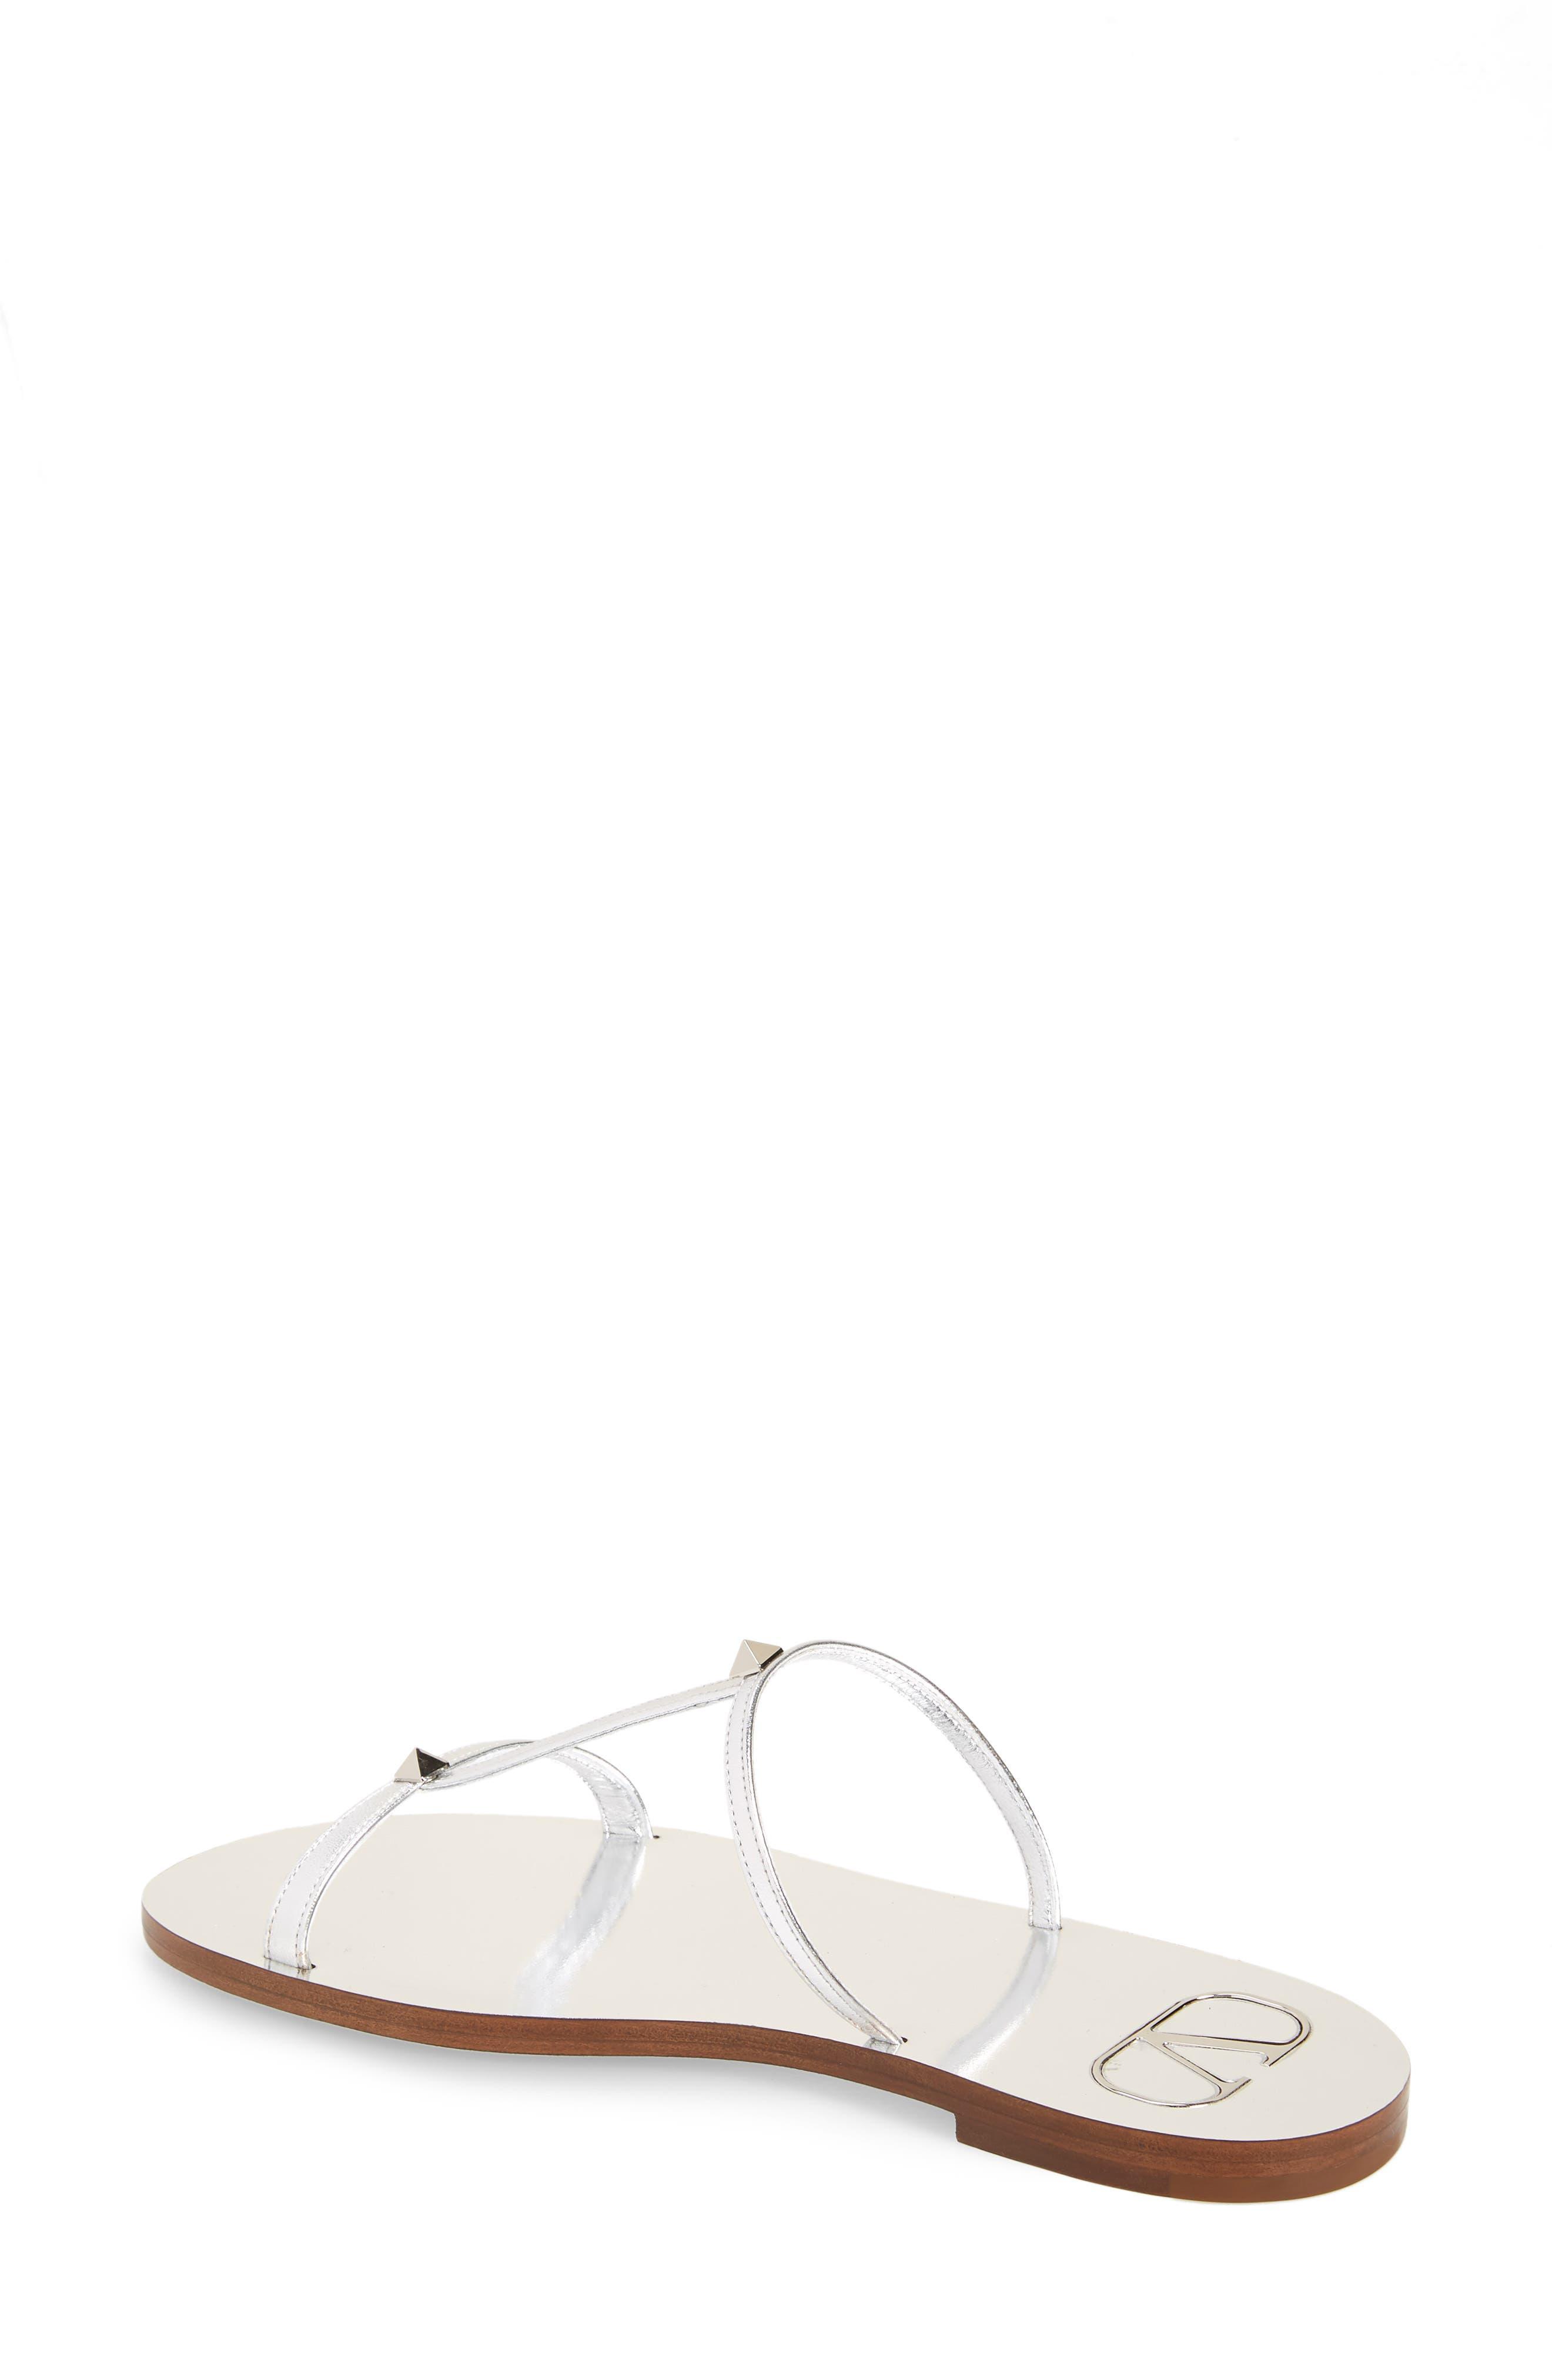 496abefb91c Designer Sandals for Women